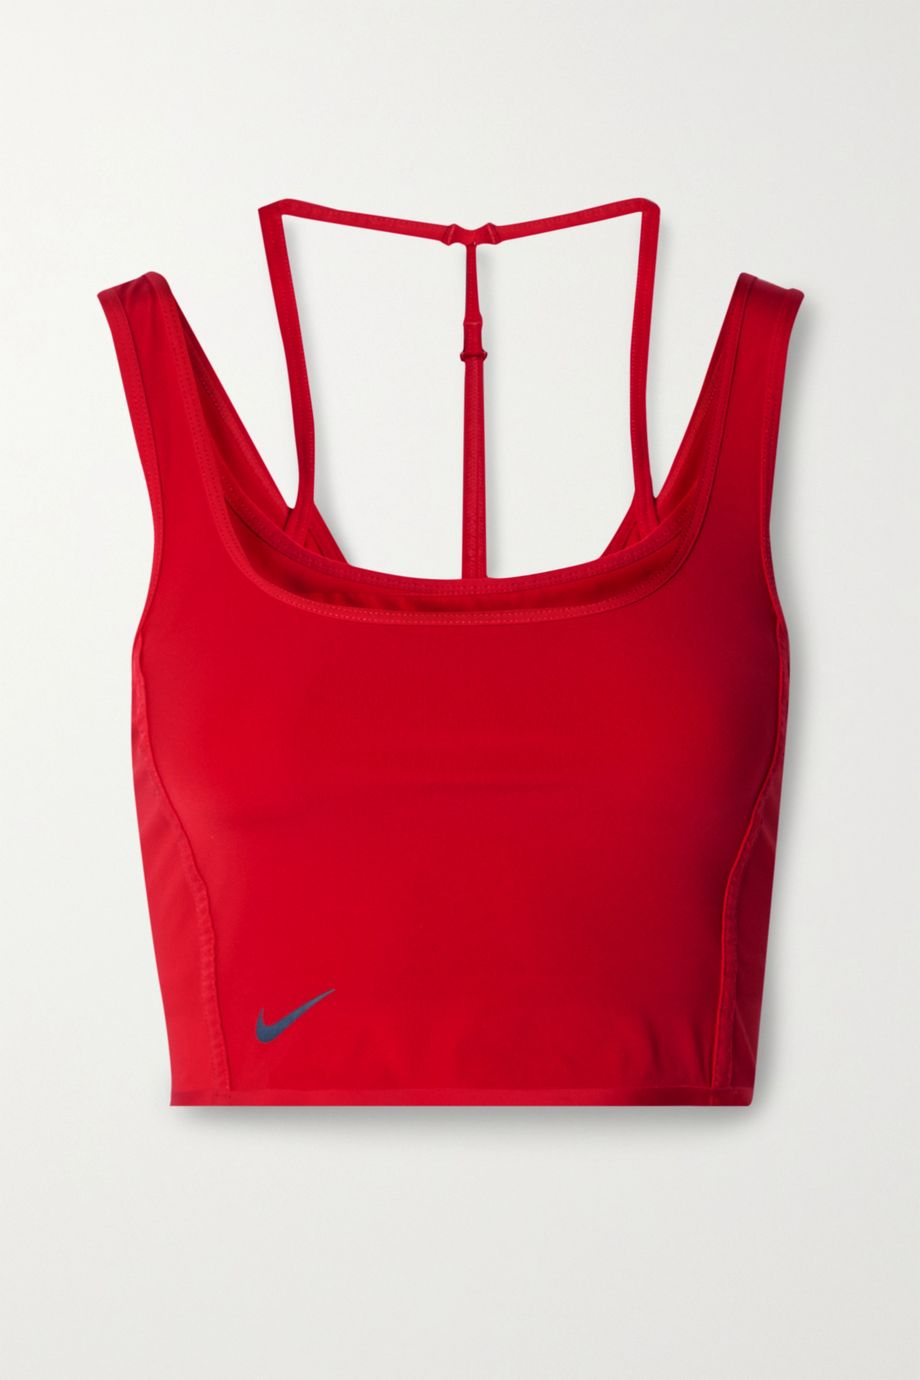 Nike City Ready cropped layered stretch tank